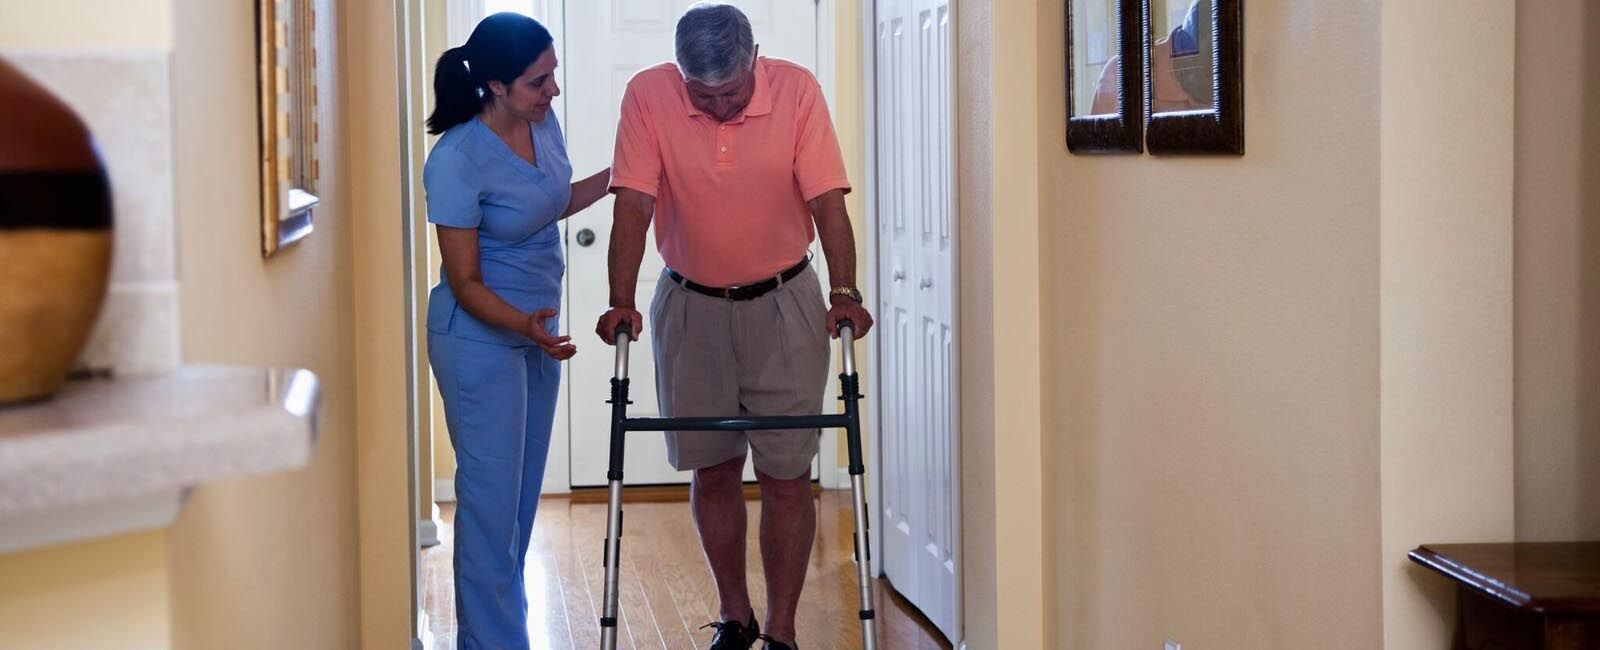 CarePlus Parkinson's Program